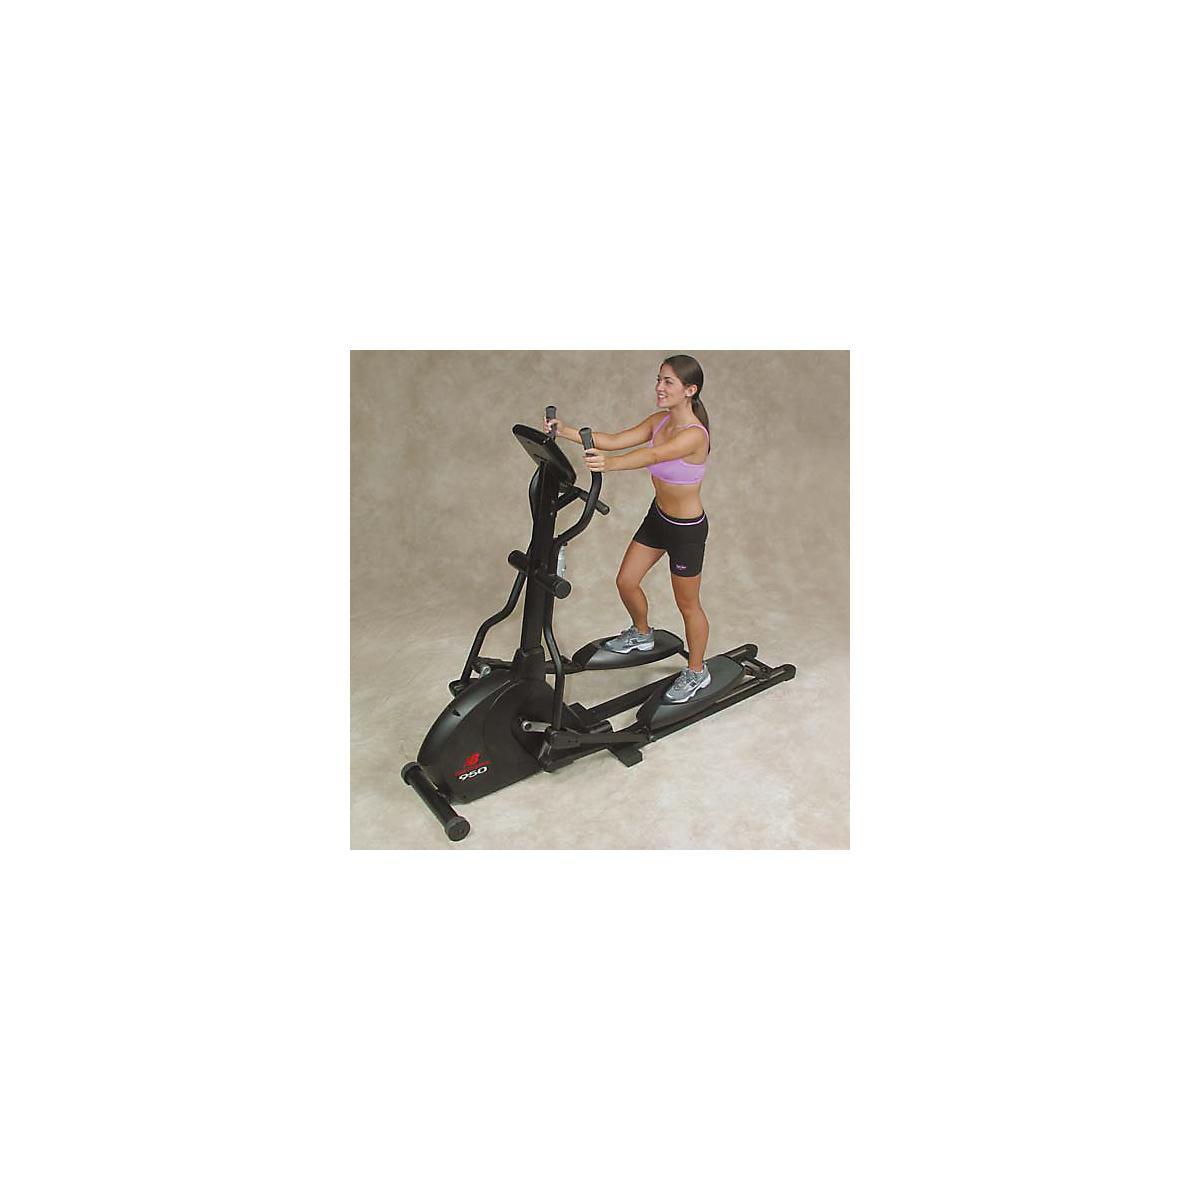 New Balance 950 Elliptical Trainer Fitness Equipment At